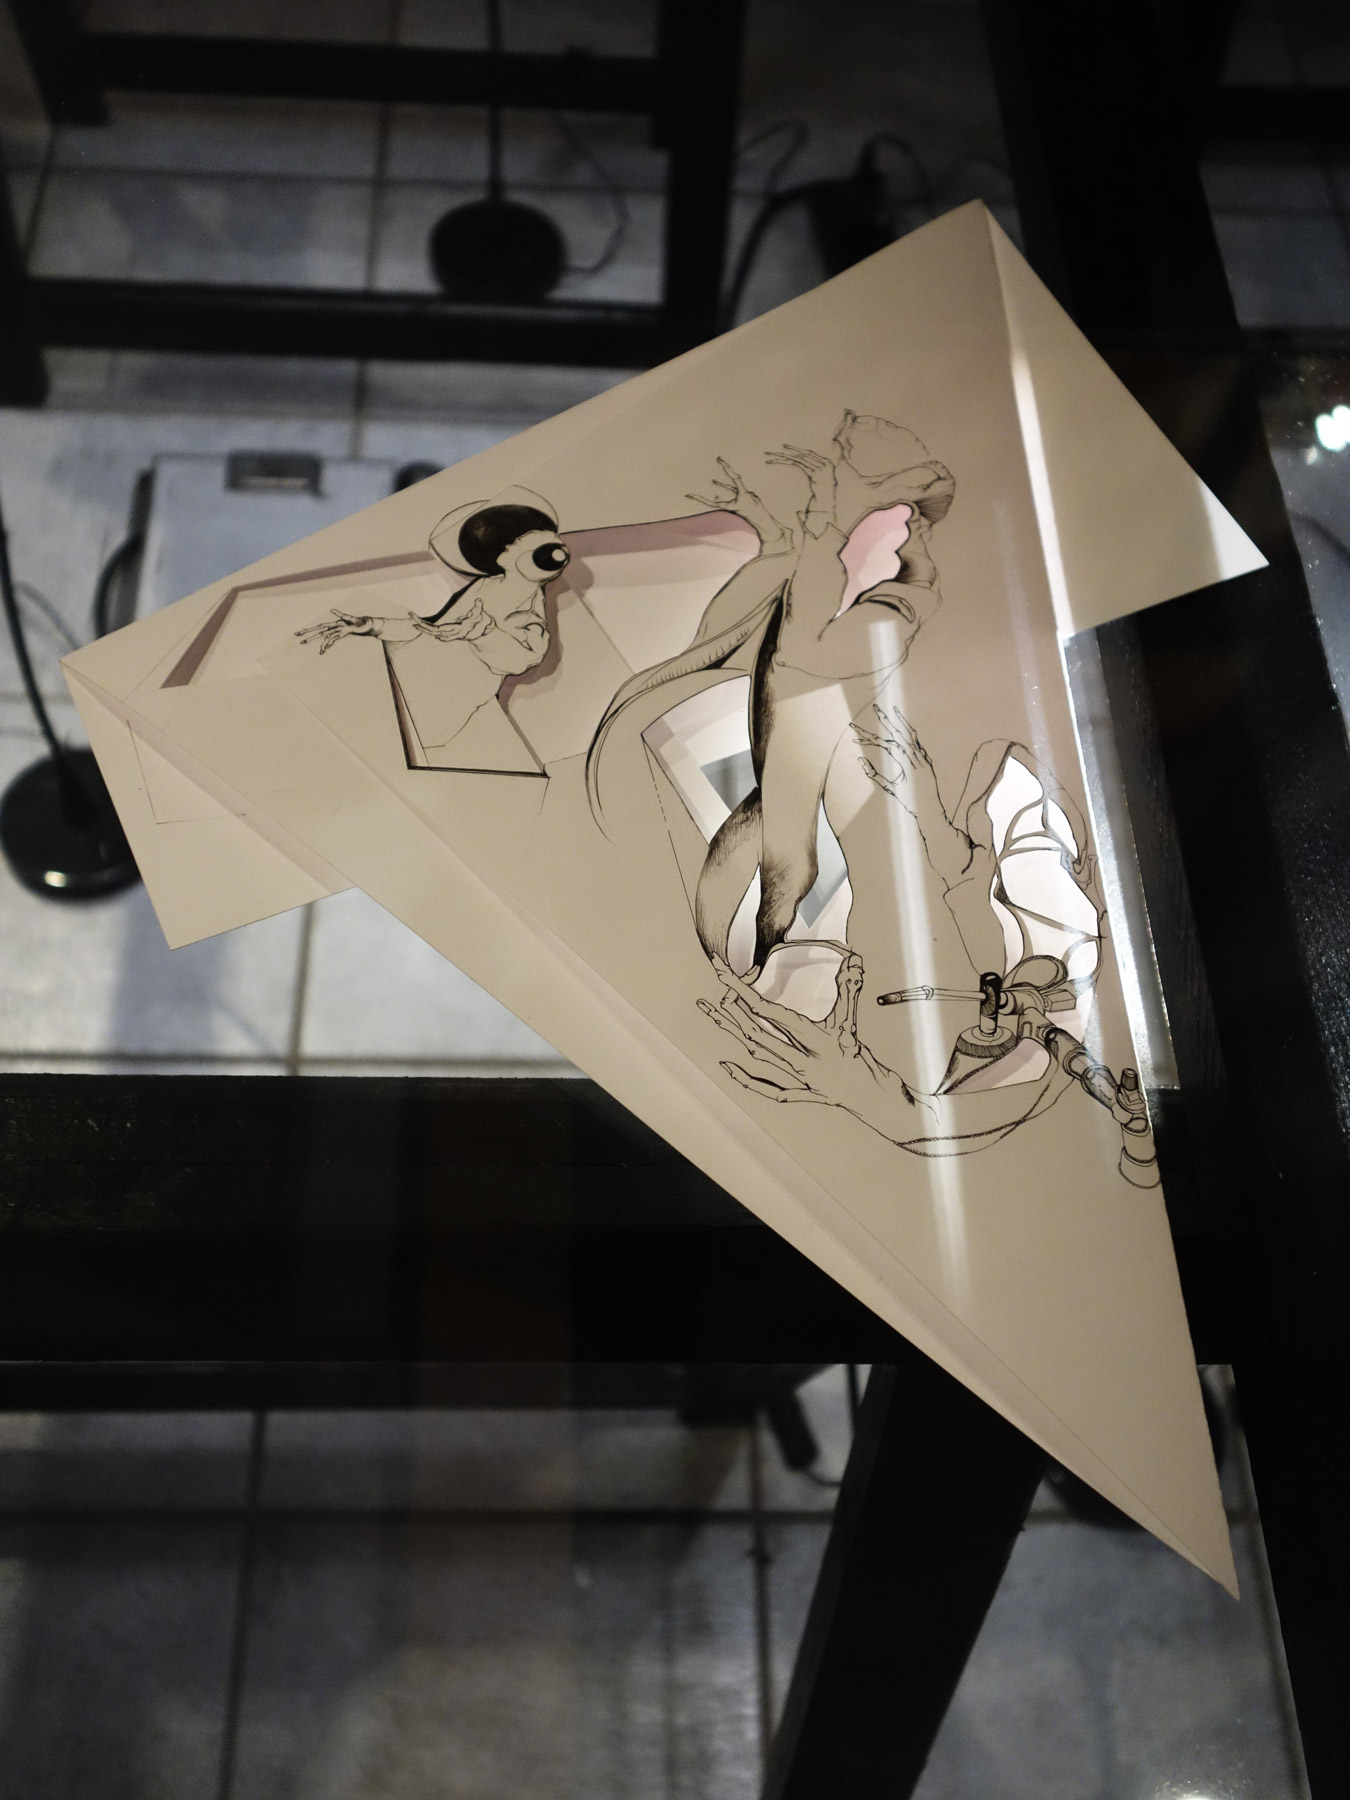 Nina Annabelle Märkl   Inselgruppe bei Kunstlicht   Ausstellung im Kunstverein Essenheim   Februar 2016